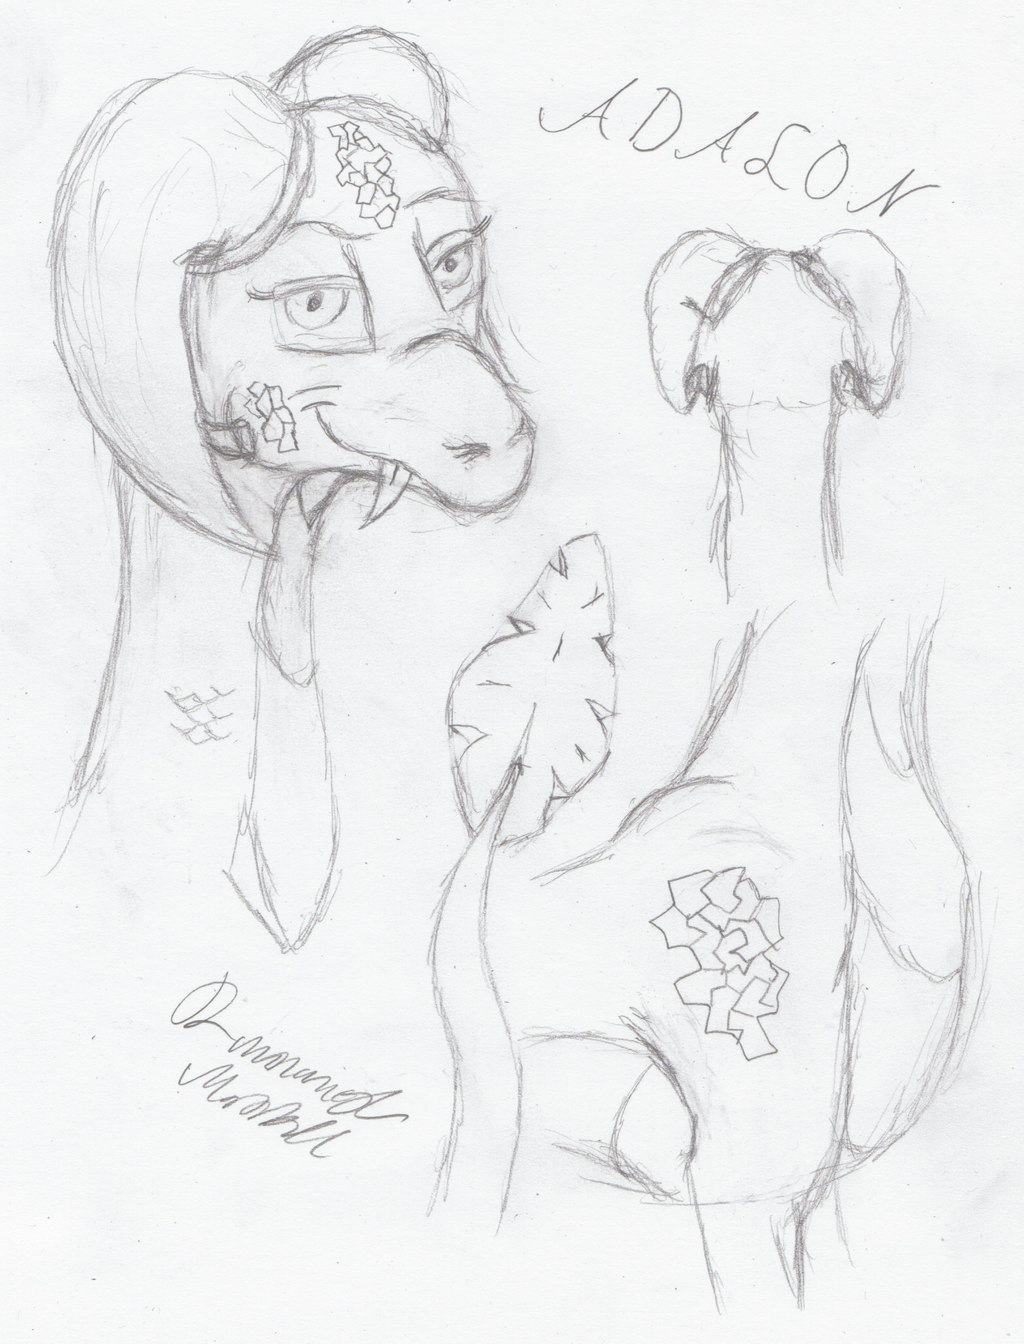 Adalon doodling